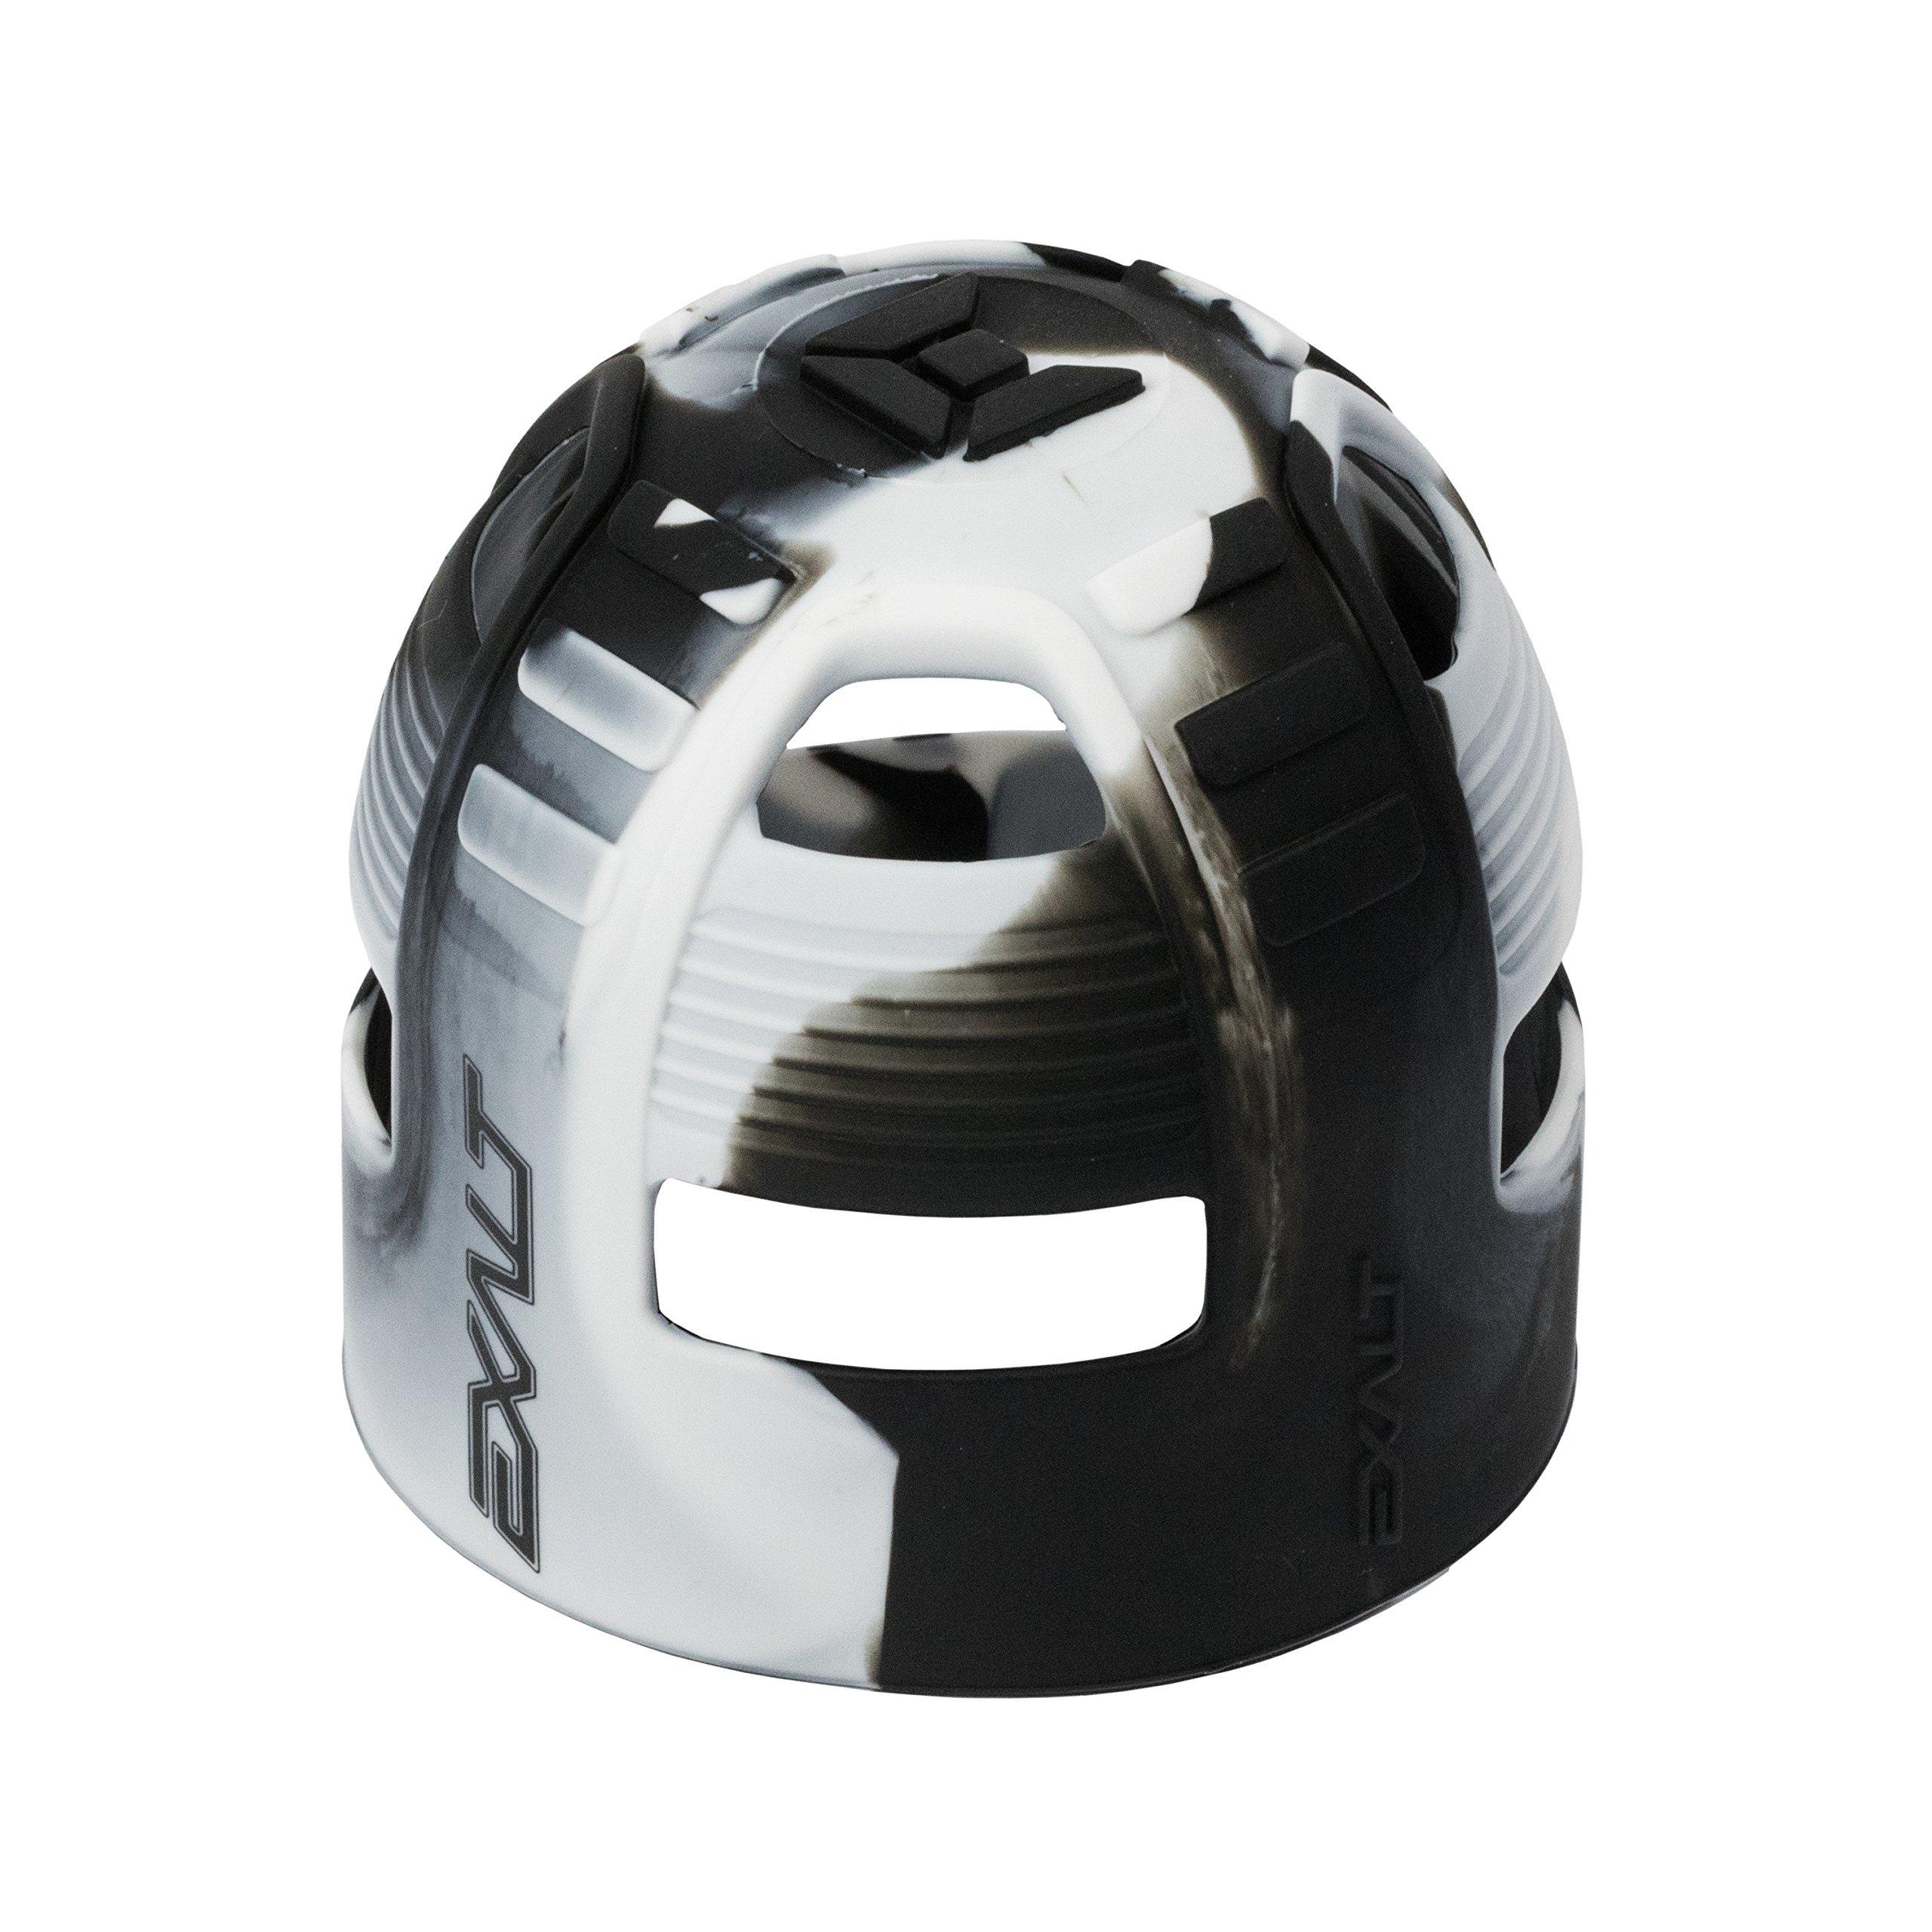 Exalt Paintball Tank Grip - Universal (45-88ci) - Zebra by Exalt